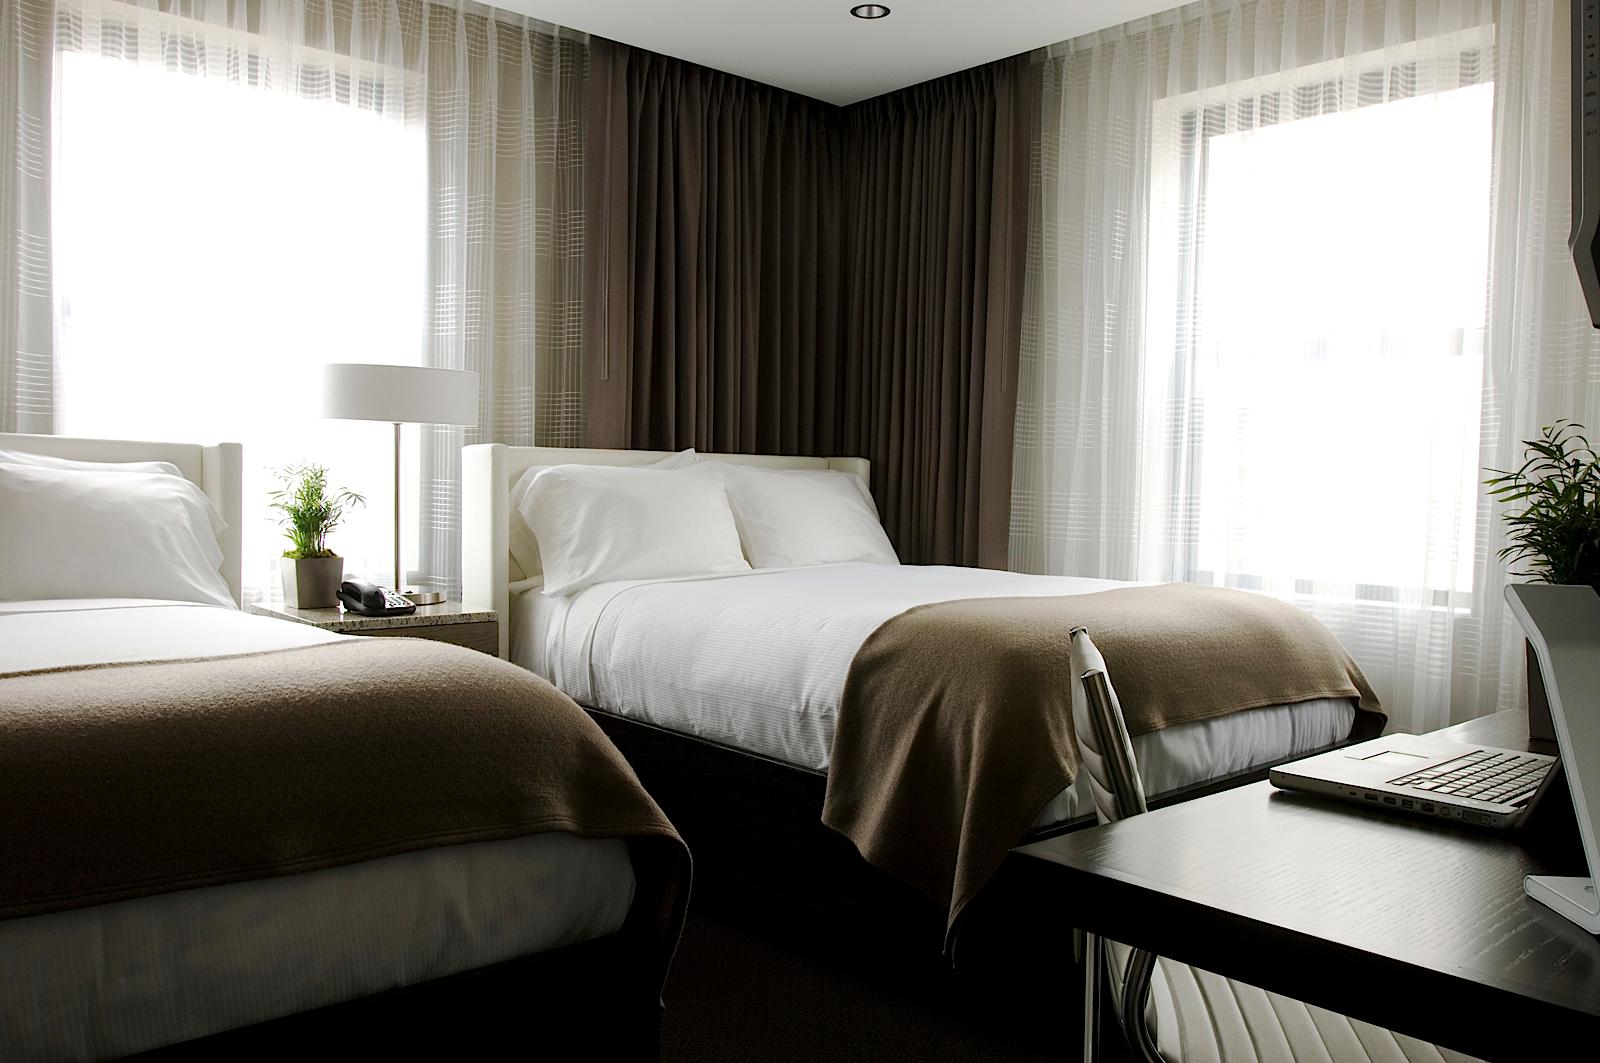 Hotel Felix image 6